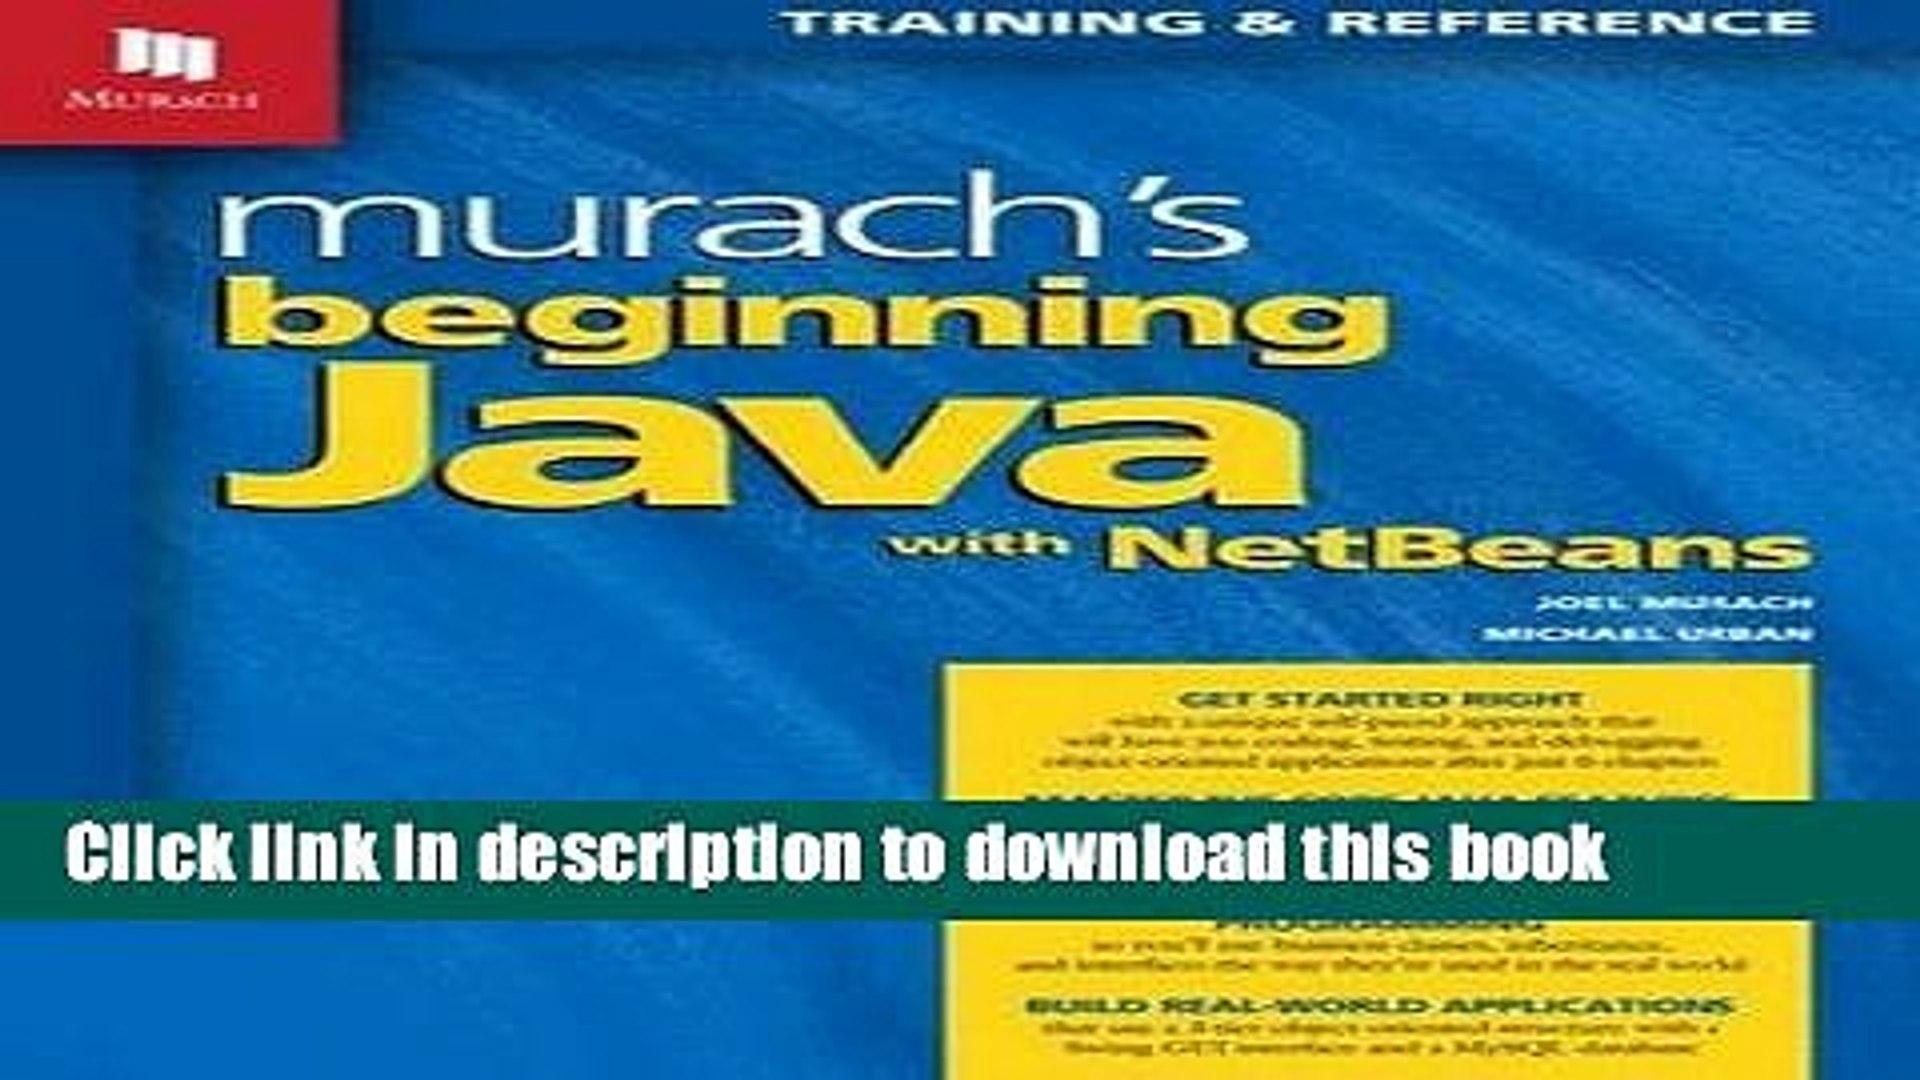 Read Murach s Beginning Java with NetBeans Ebook PDF - video dailymotion